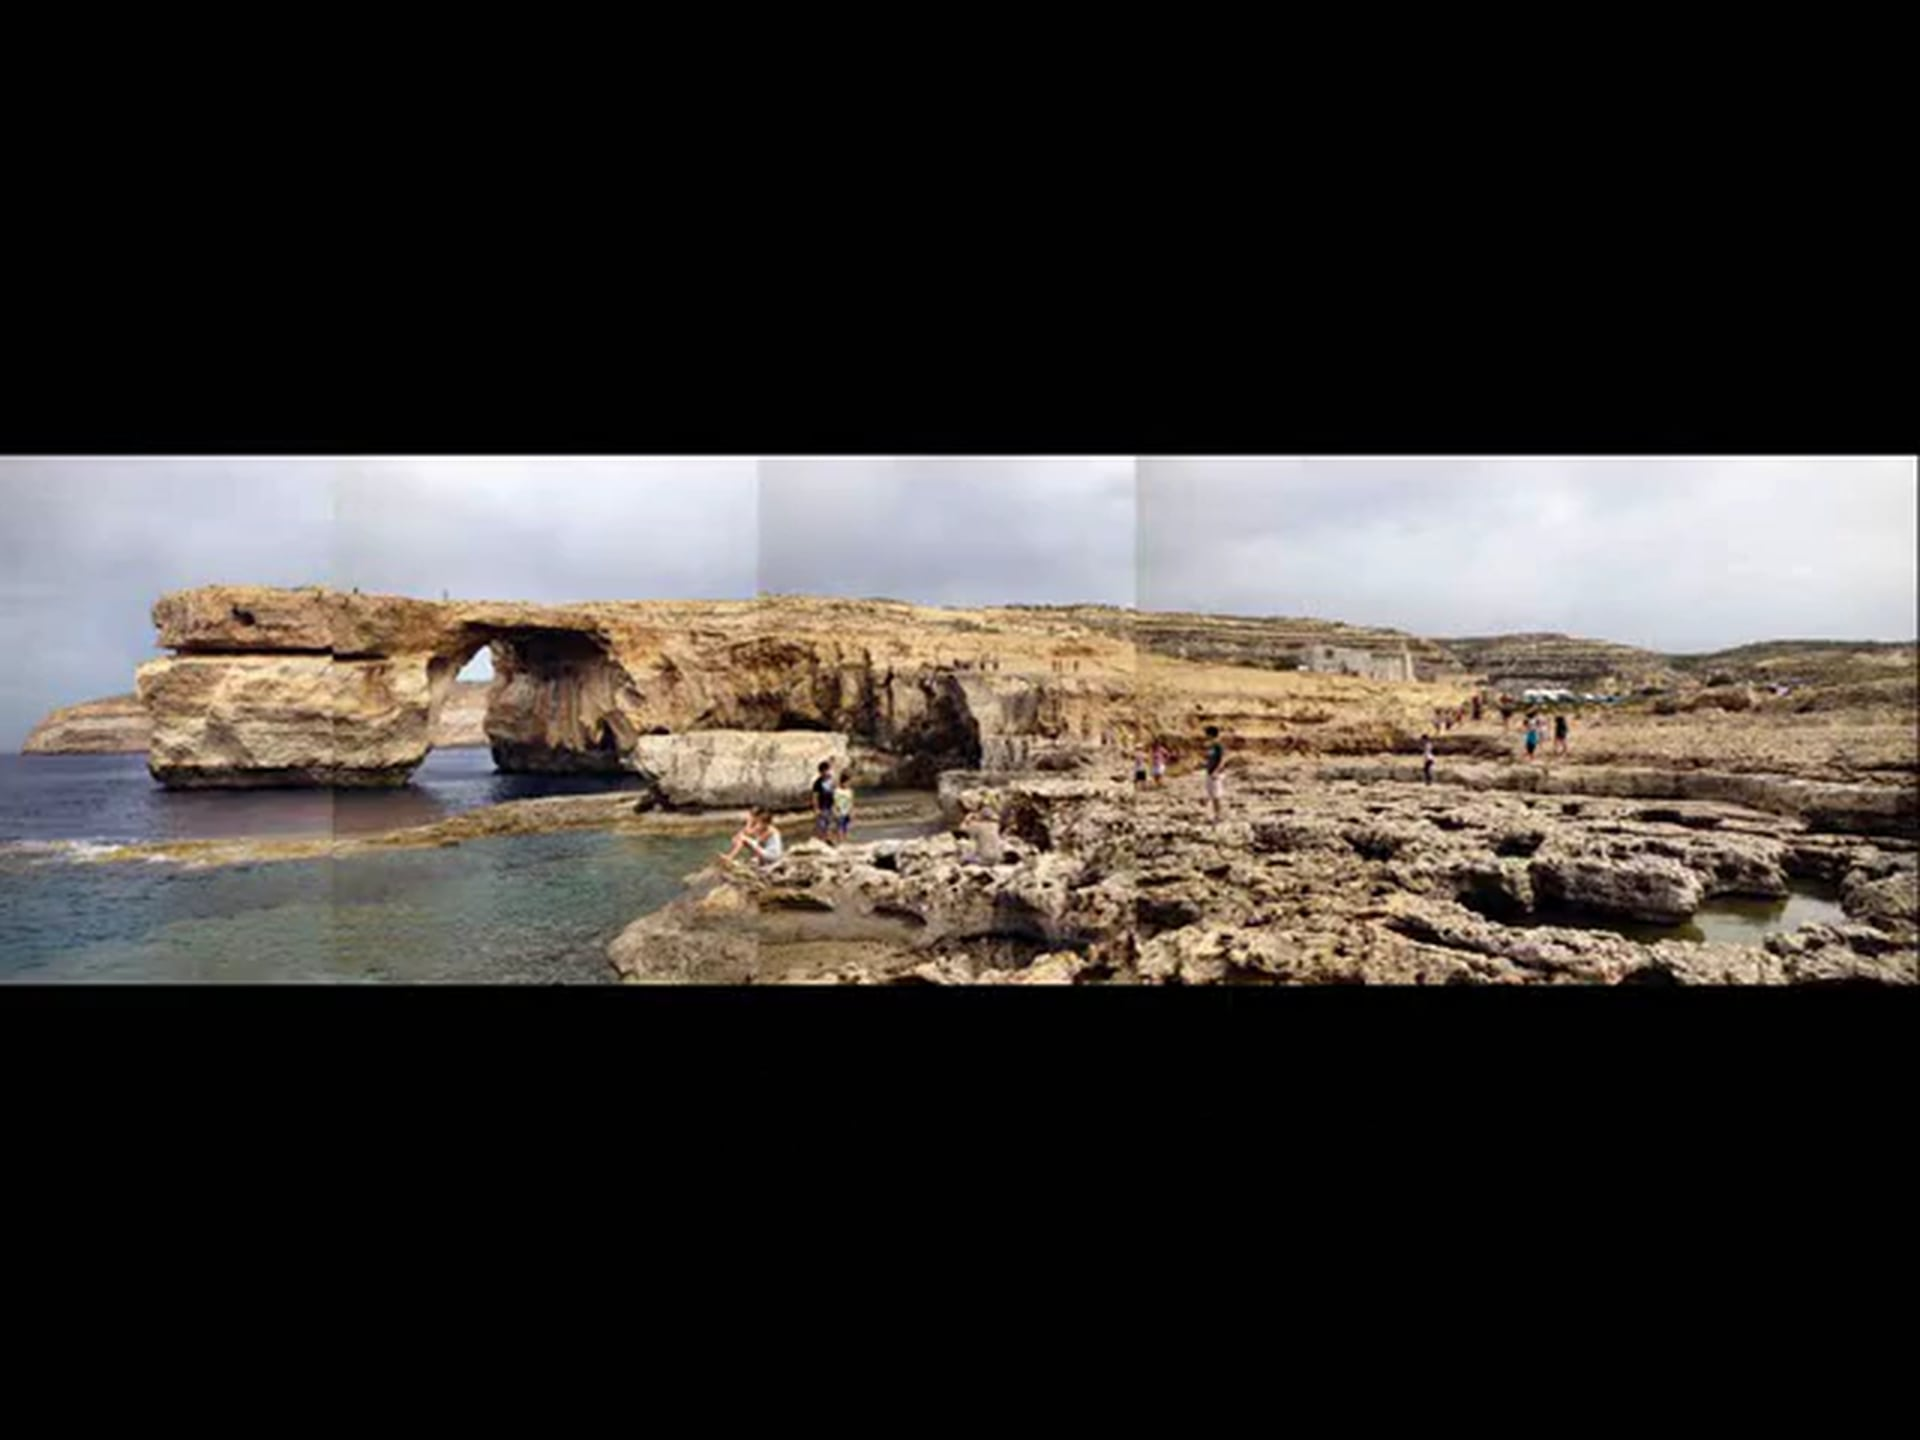 201311-18 Malta diving trip .wmv